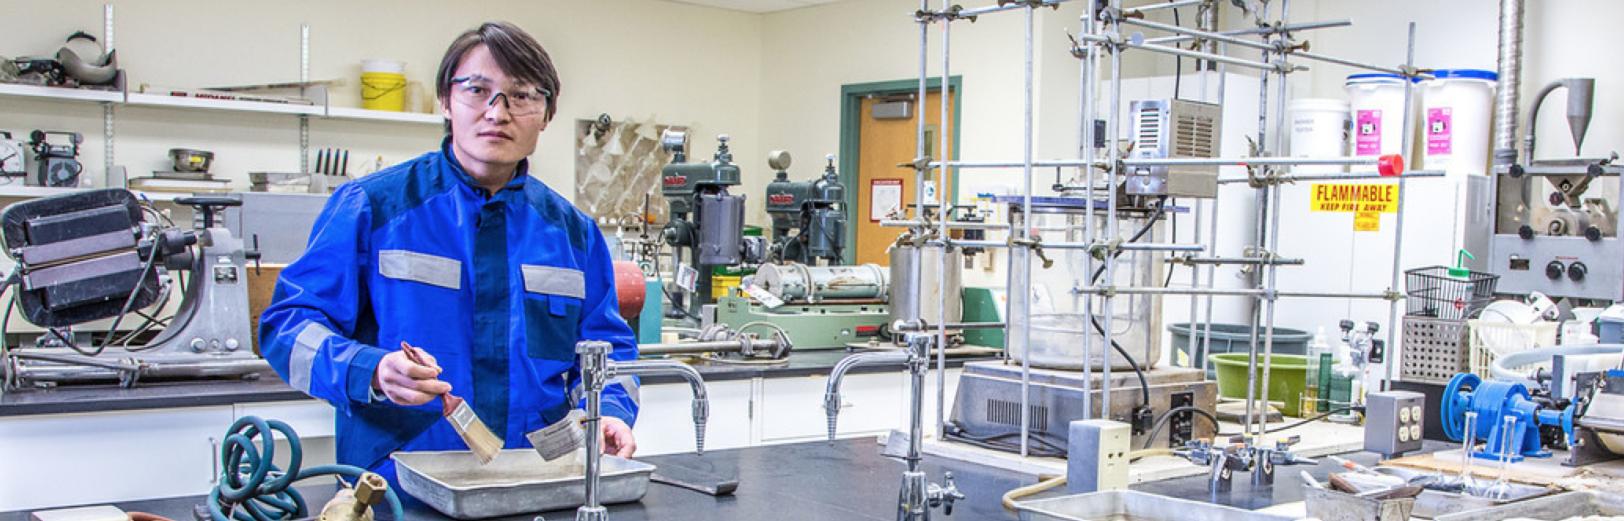 UAF graduate student Purevbaatar Narantsetseg works with samples of rare earth minerals